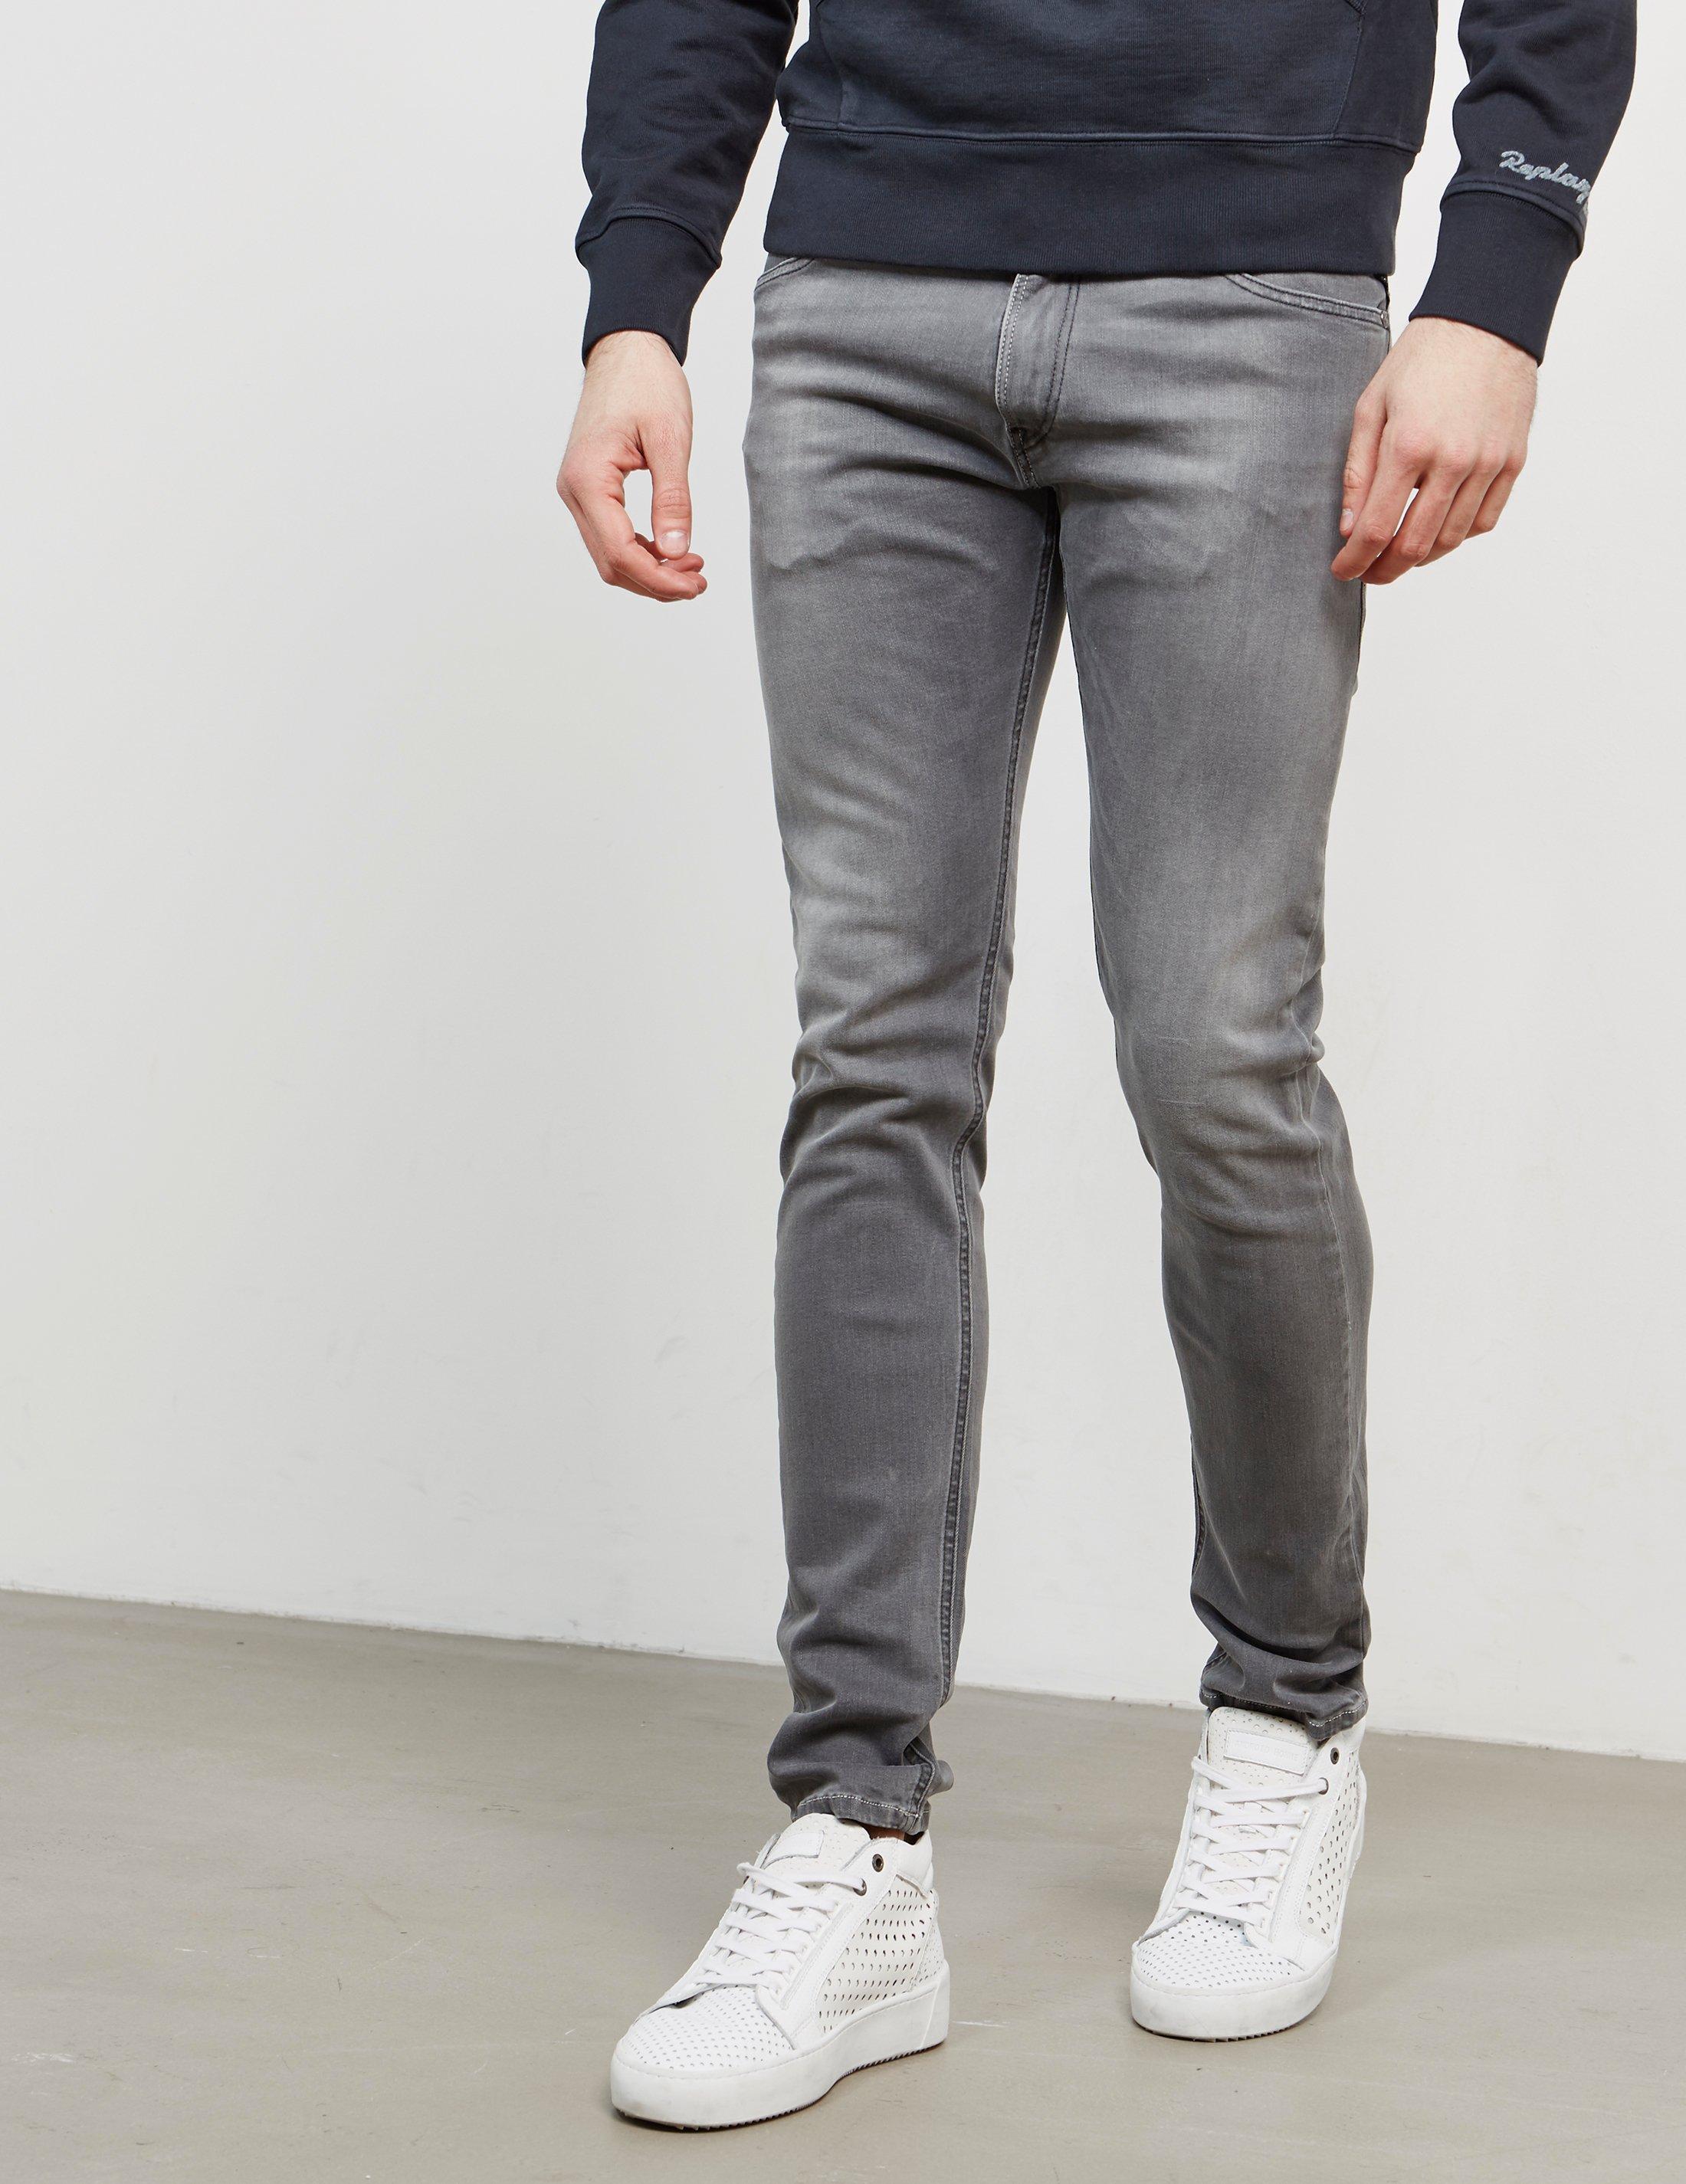 440e5a12efa Replay Mens Jondrill Skinny Jeans Grey in Gray for Men - Lyst